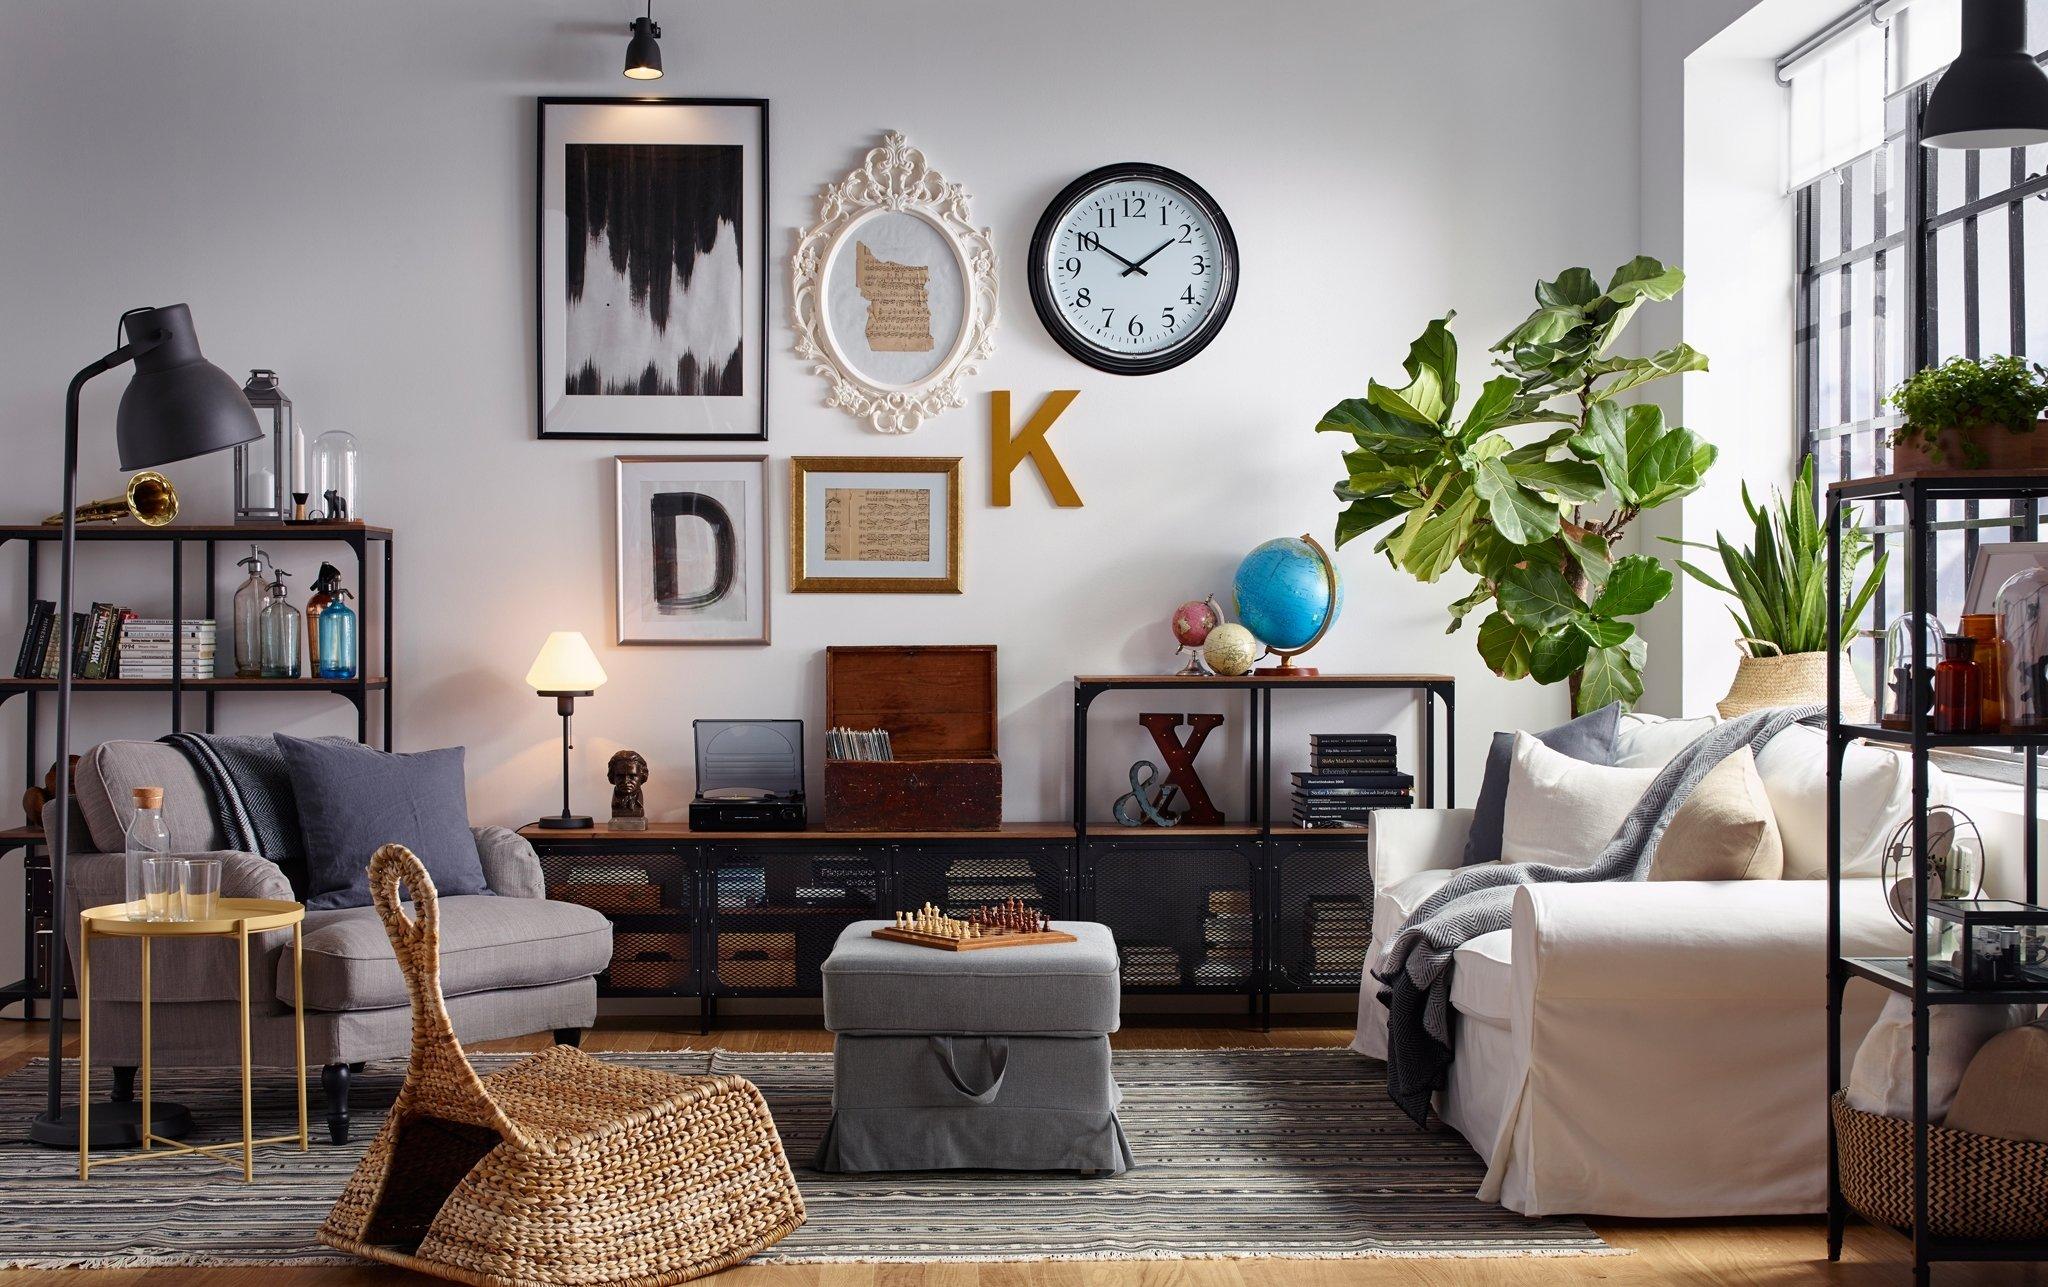 10 Great Ikea Ideas For Living Room Ikea Bedroom Ideas For Small Rooms Ikea  Showroom Ikea